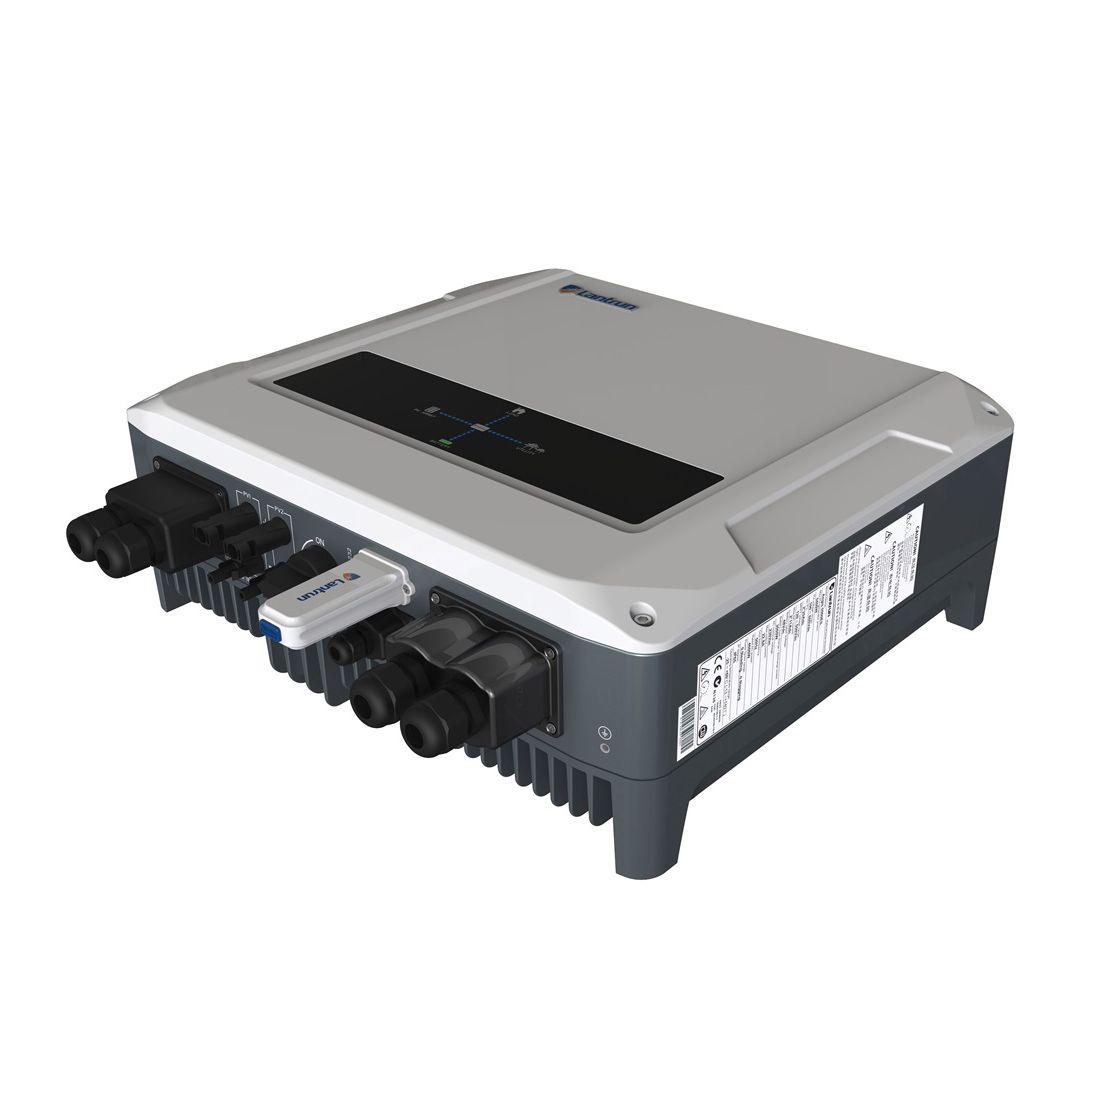 Inverter (หม้อแปลงไฟฟ้า) รุ่น Hybrid 3600W/230V/50Hz/48VDC (Aegis 3600ES)